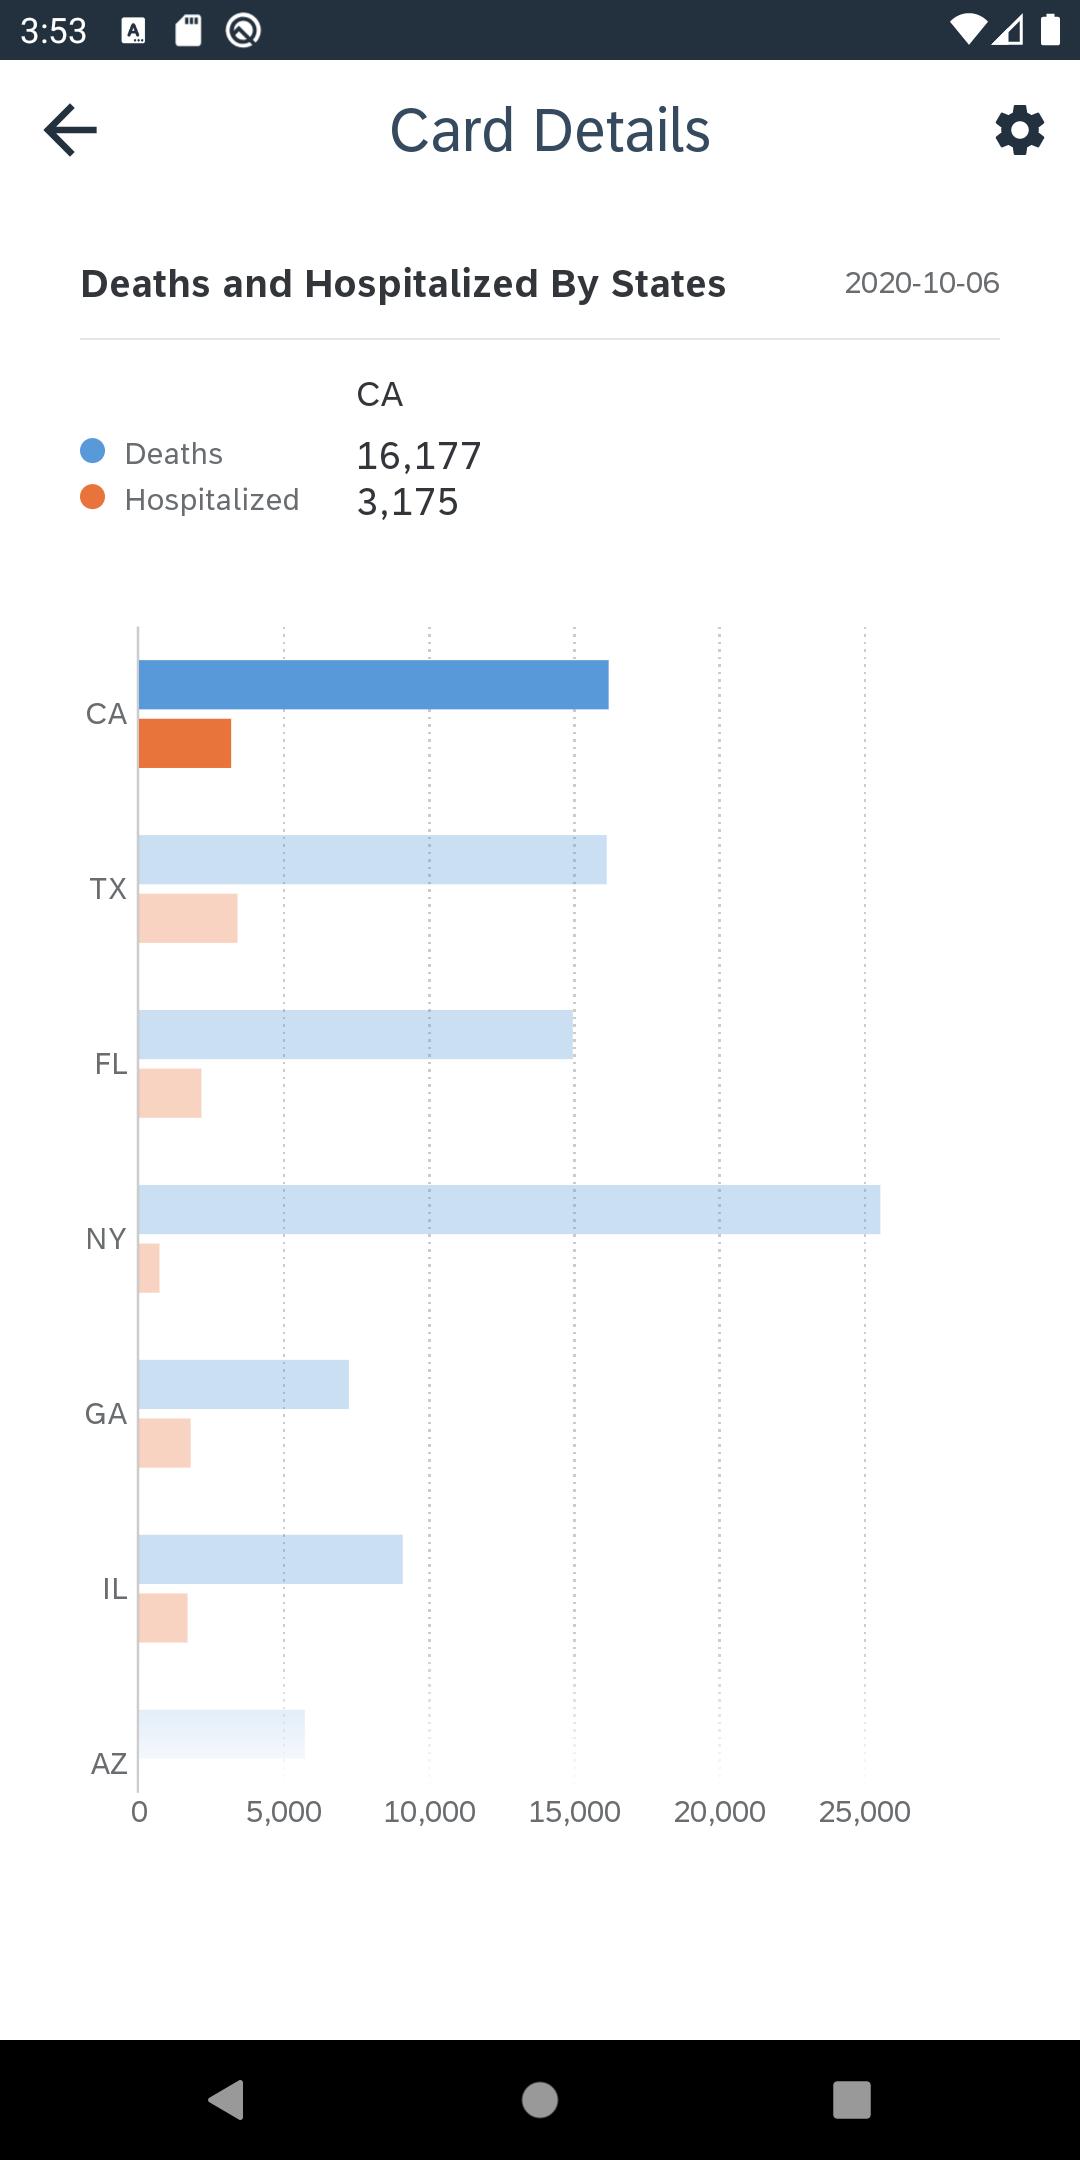 Chart%20Details%20in%20Fiori%20Horizontal%20Bar%20Chart%20View